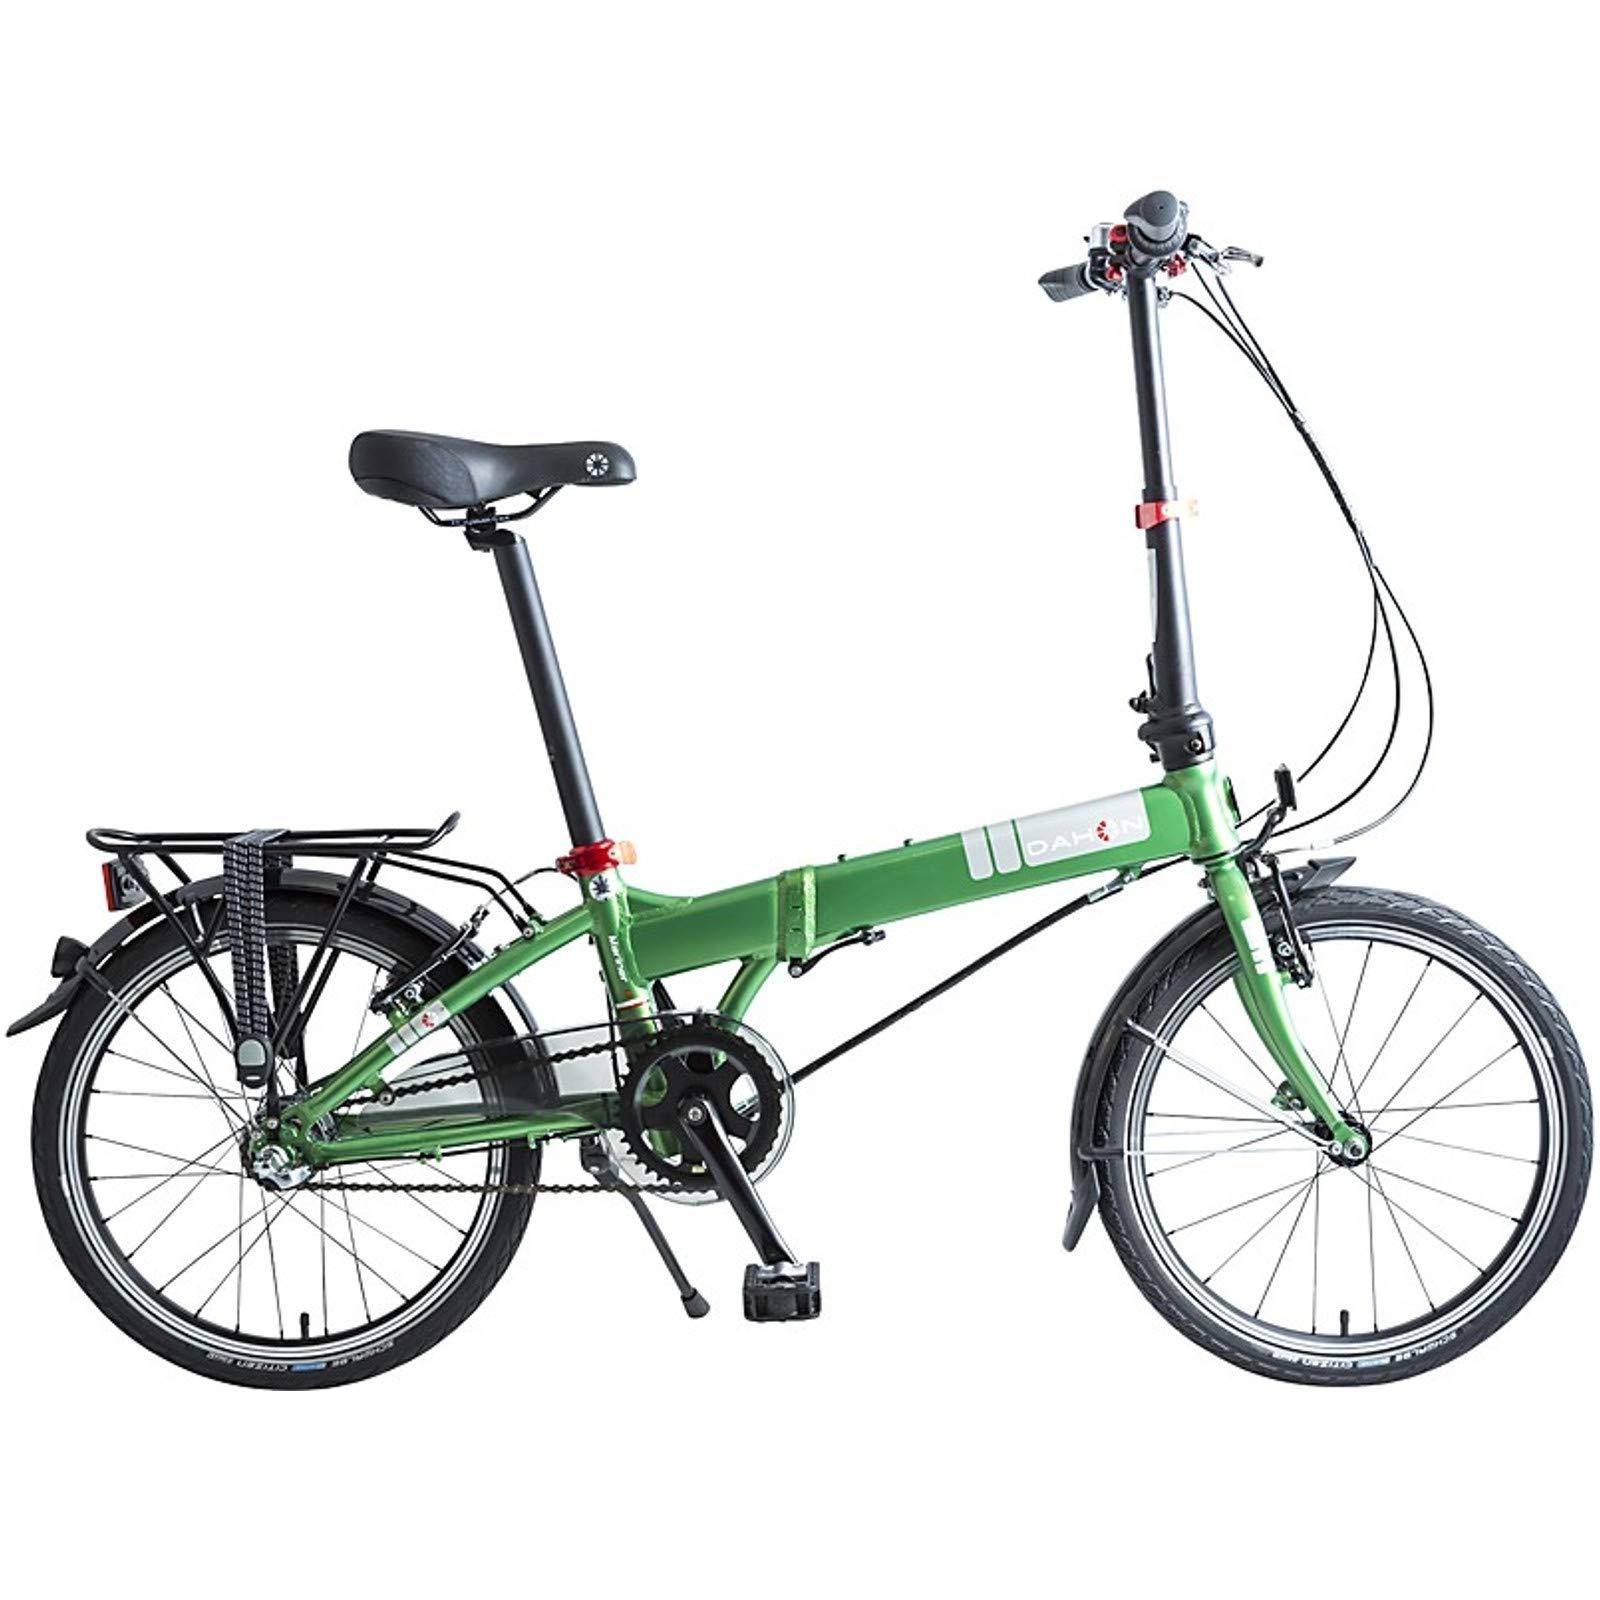 Dahon Mariner i3, Bicicleta Plegable Unisex Adulto, Verde, 20 ...